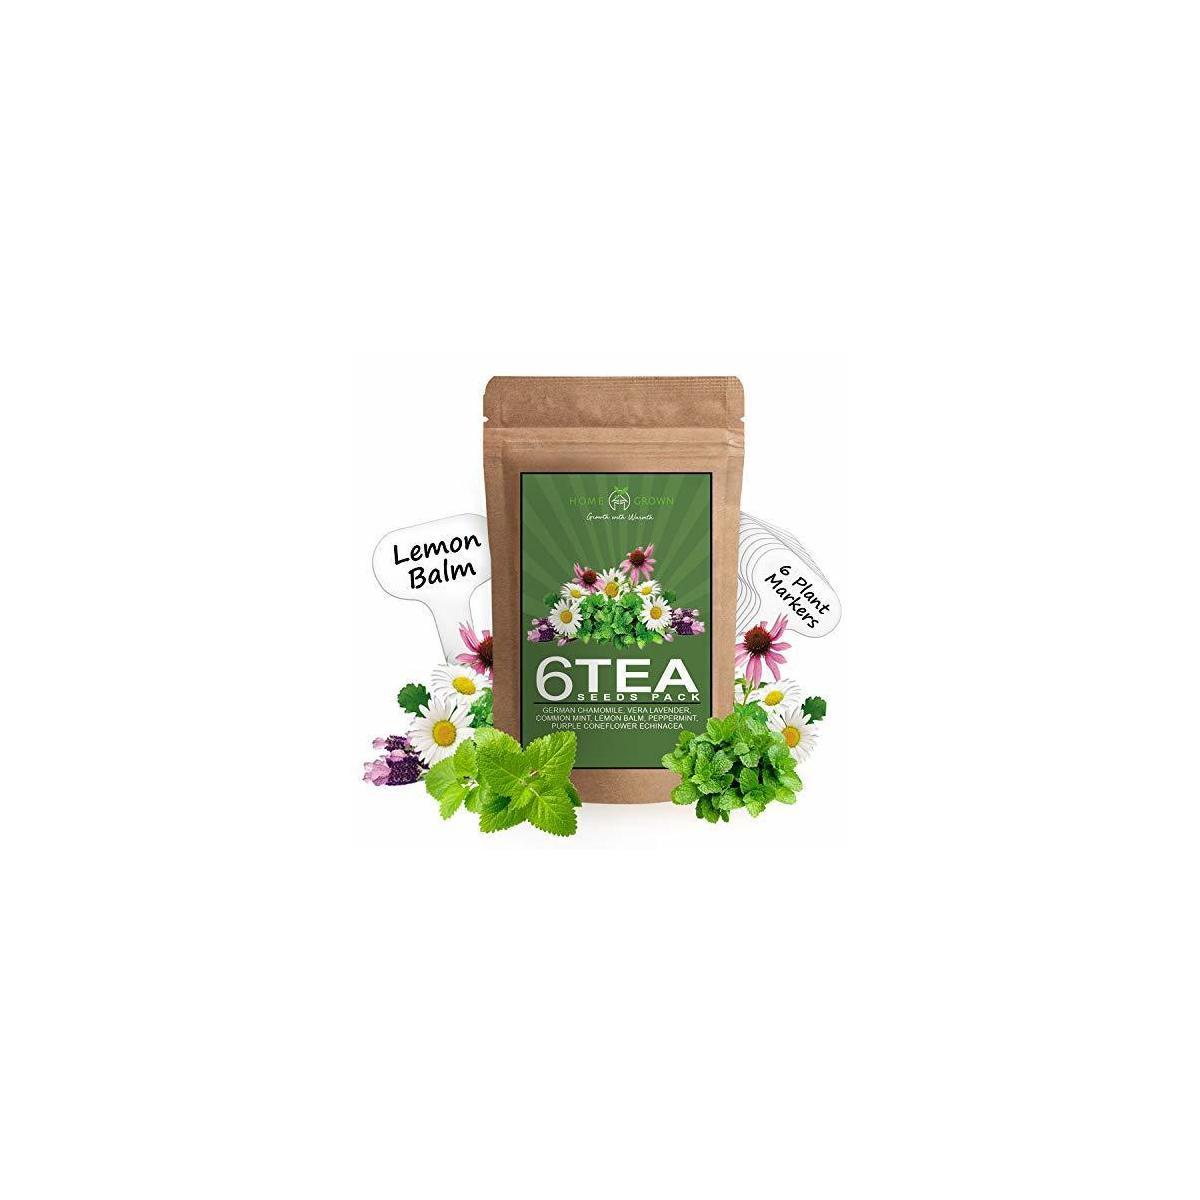 6 Tea Herb Seeds Pack - Herbal and Medicinal Tea Seeds for Planting